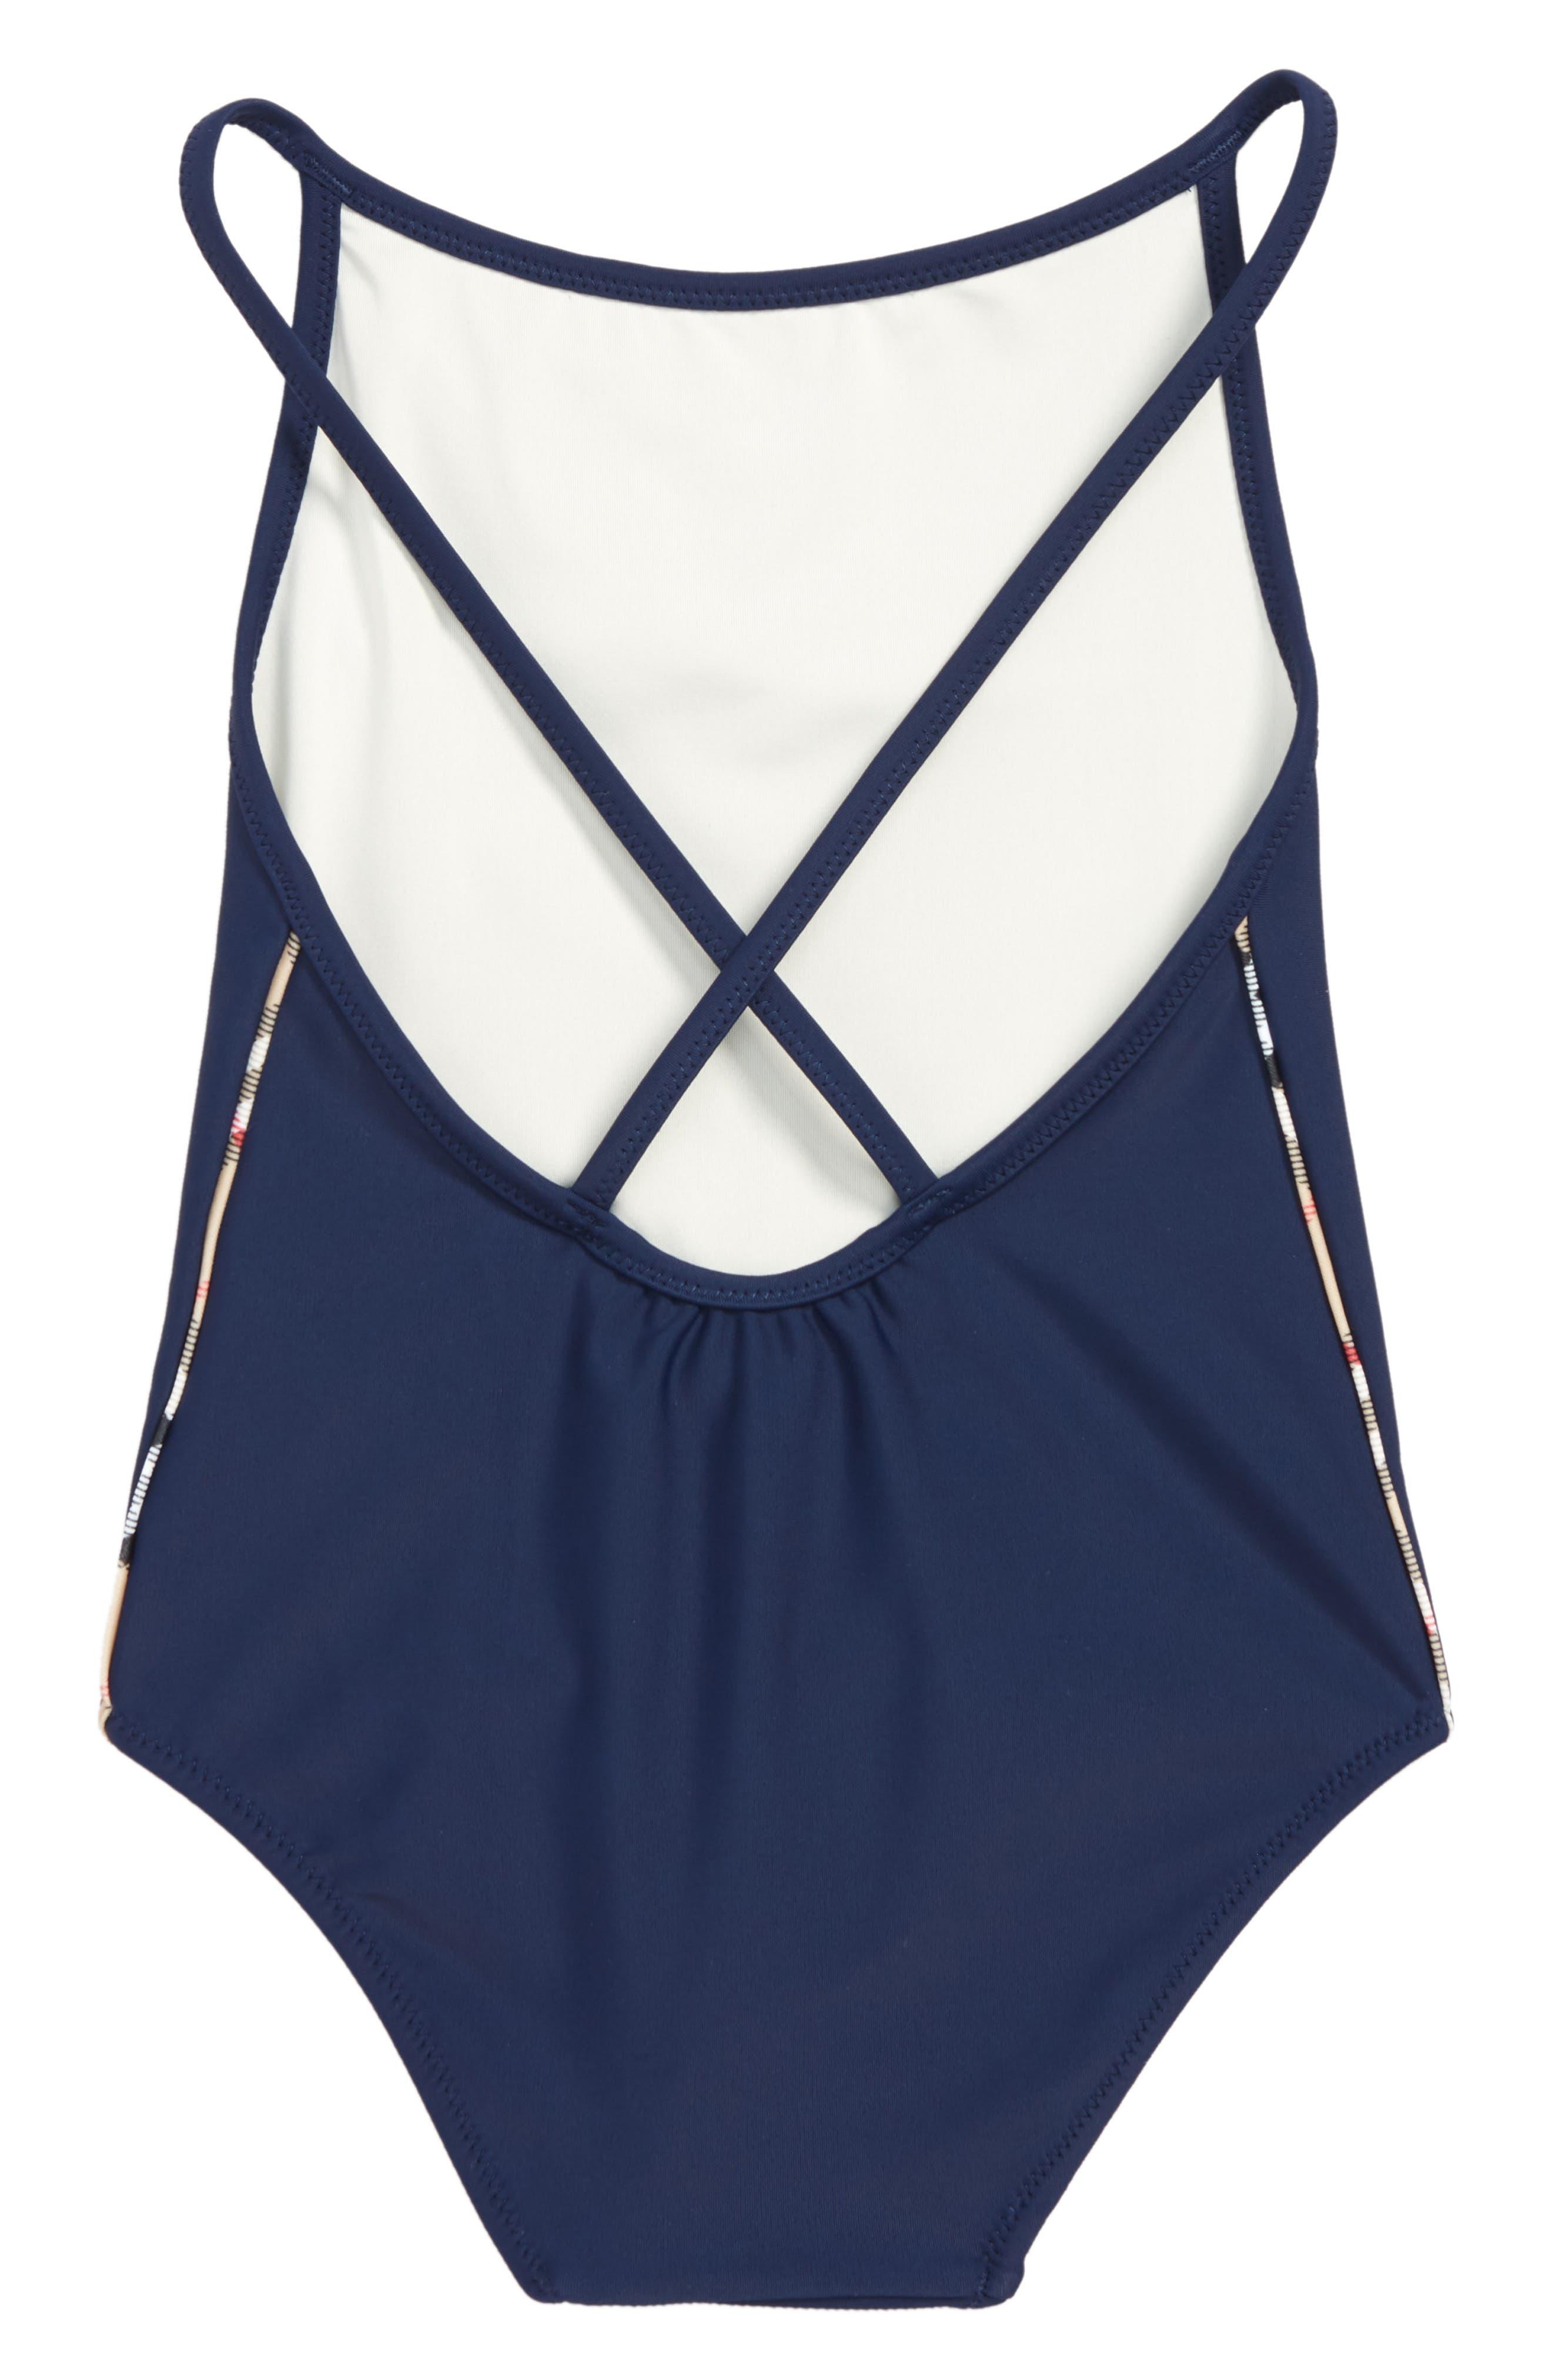 Sandine One-Piece Swimsuit,                             Alternate thumbnail 2, color,                             NAVY